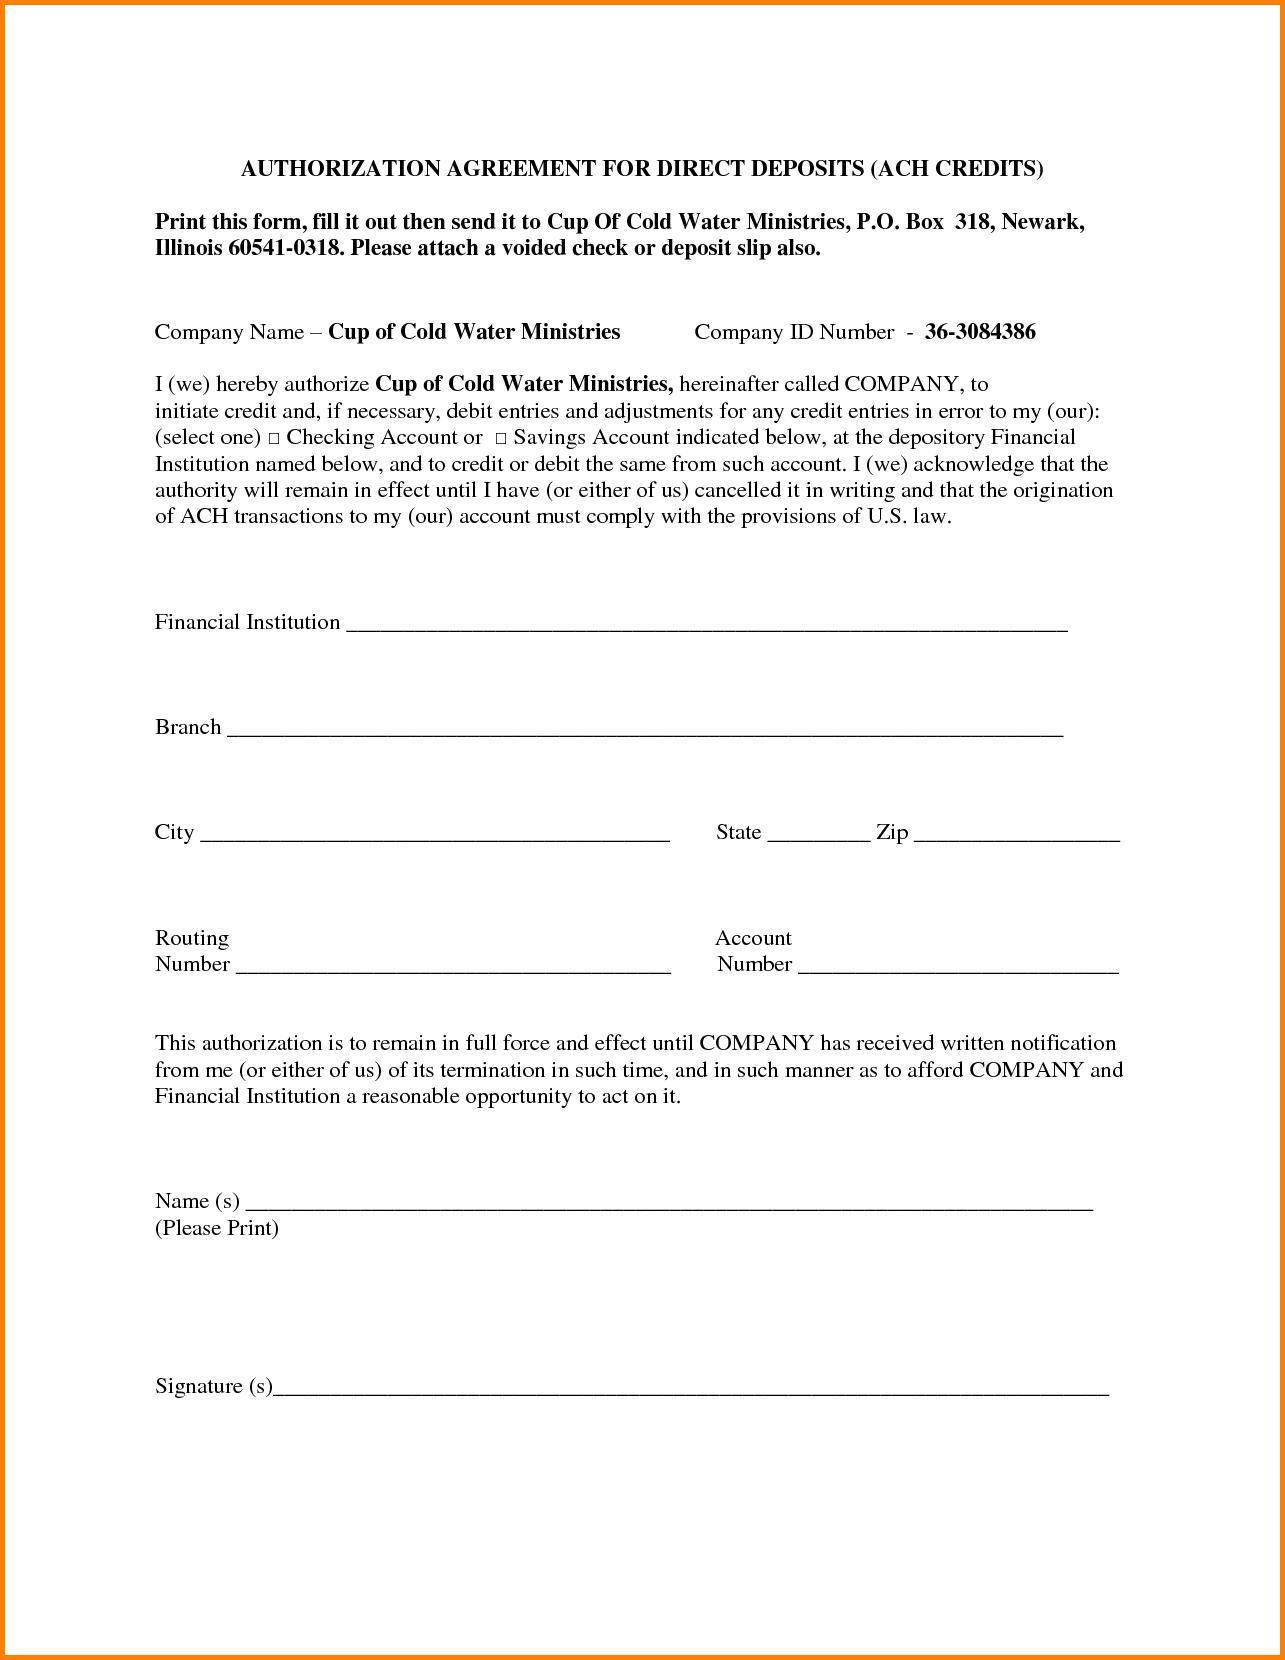 Ach Authorization Form Wells Fargo